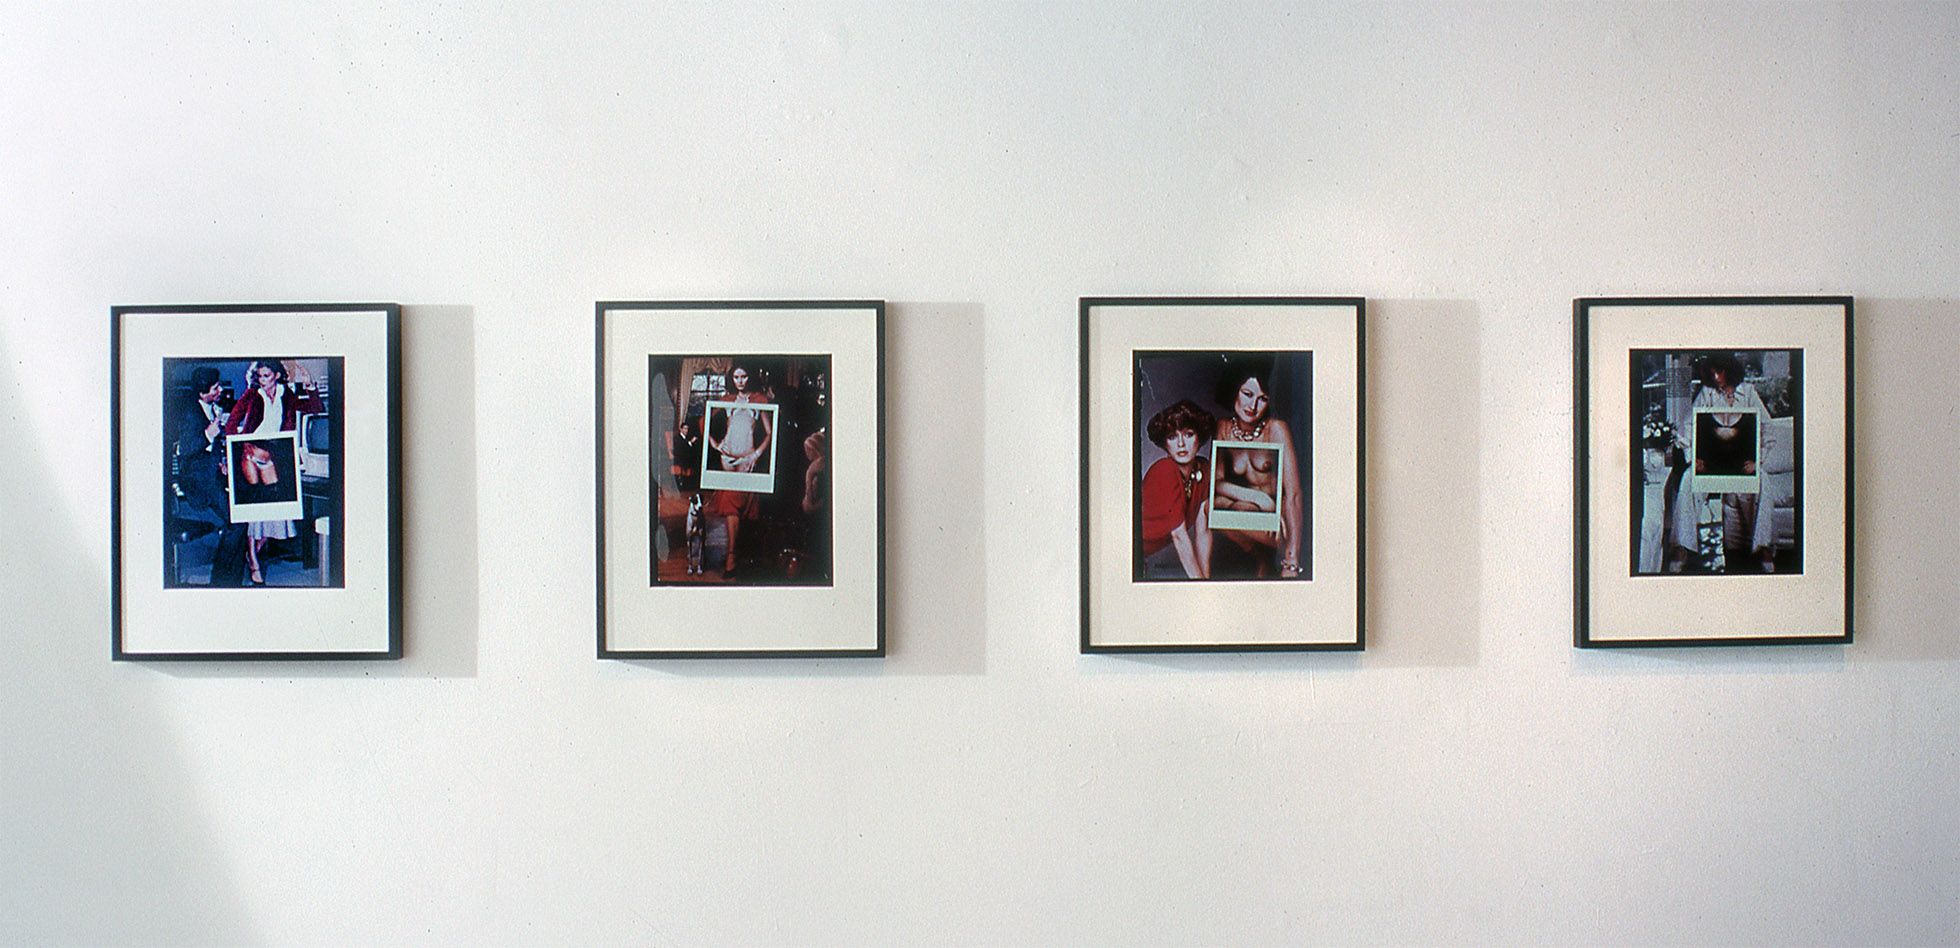 """Cliche very"" Sherry Frumkin Gallery 2001"